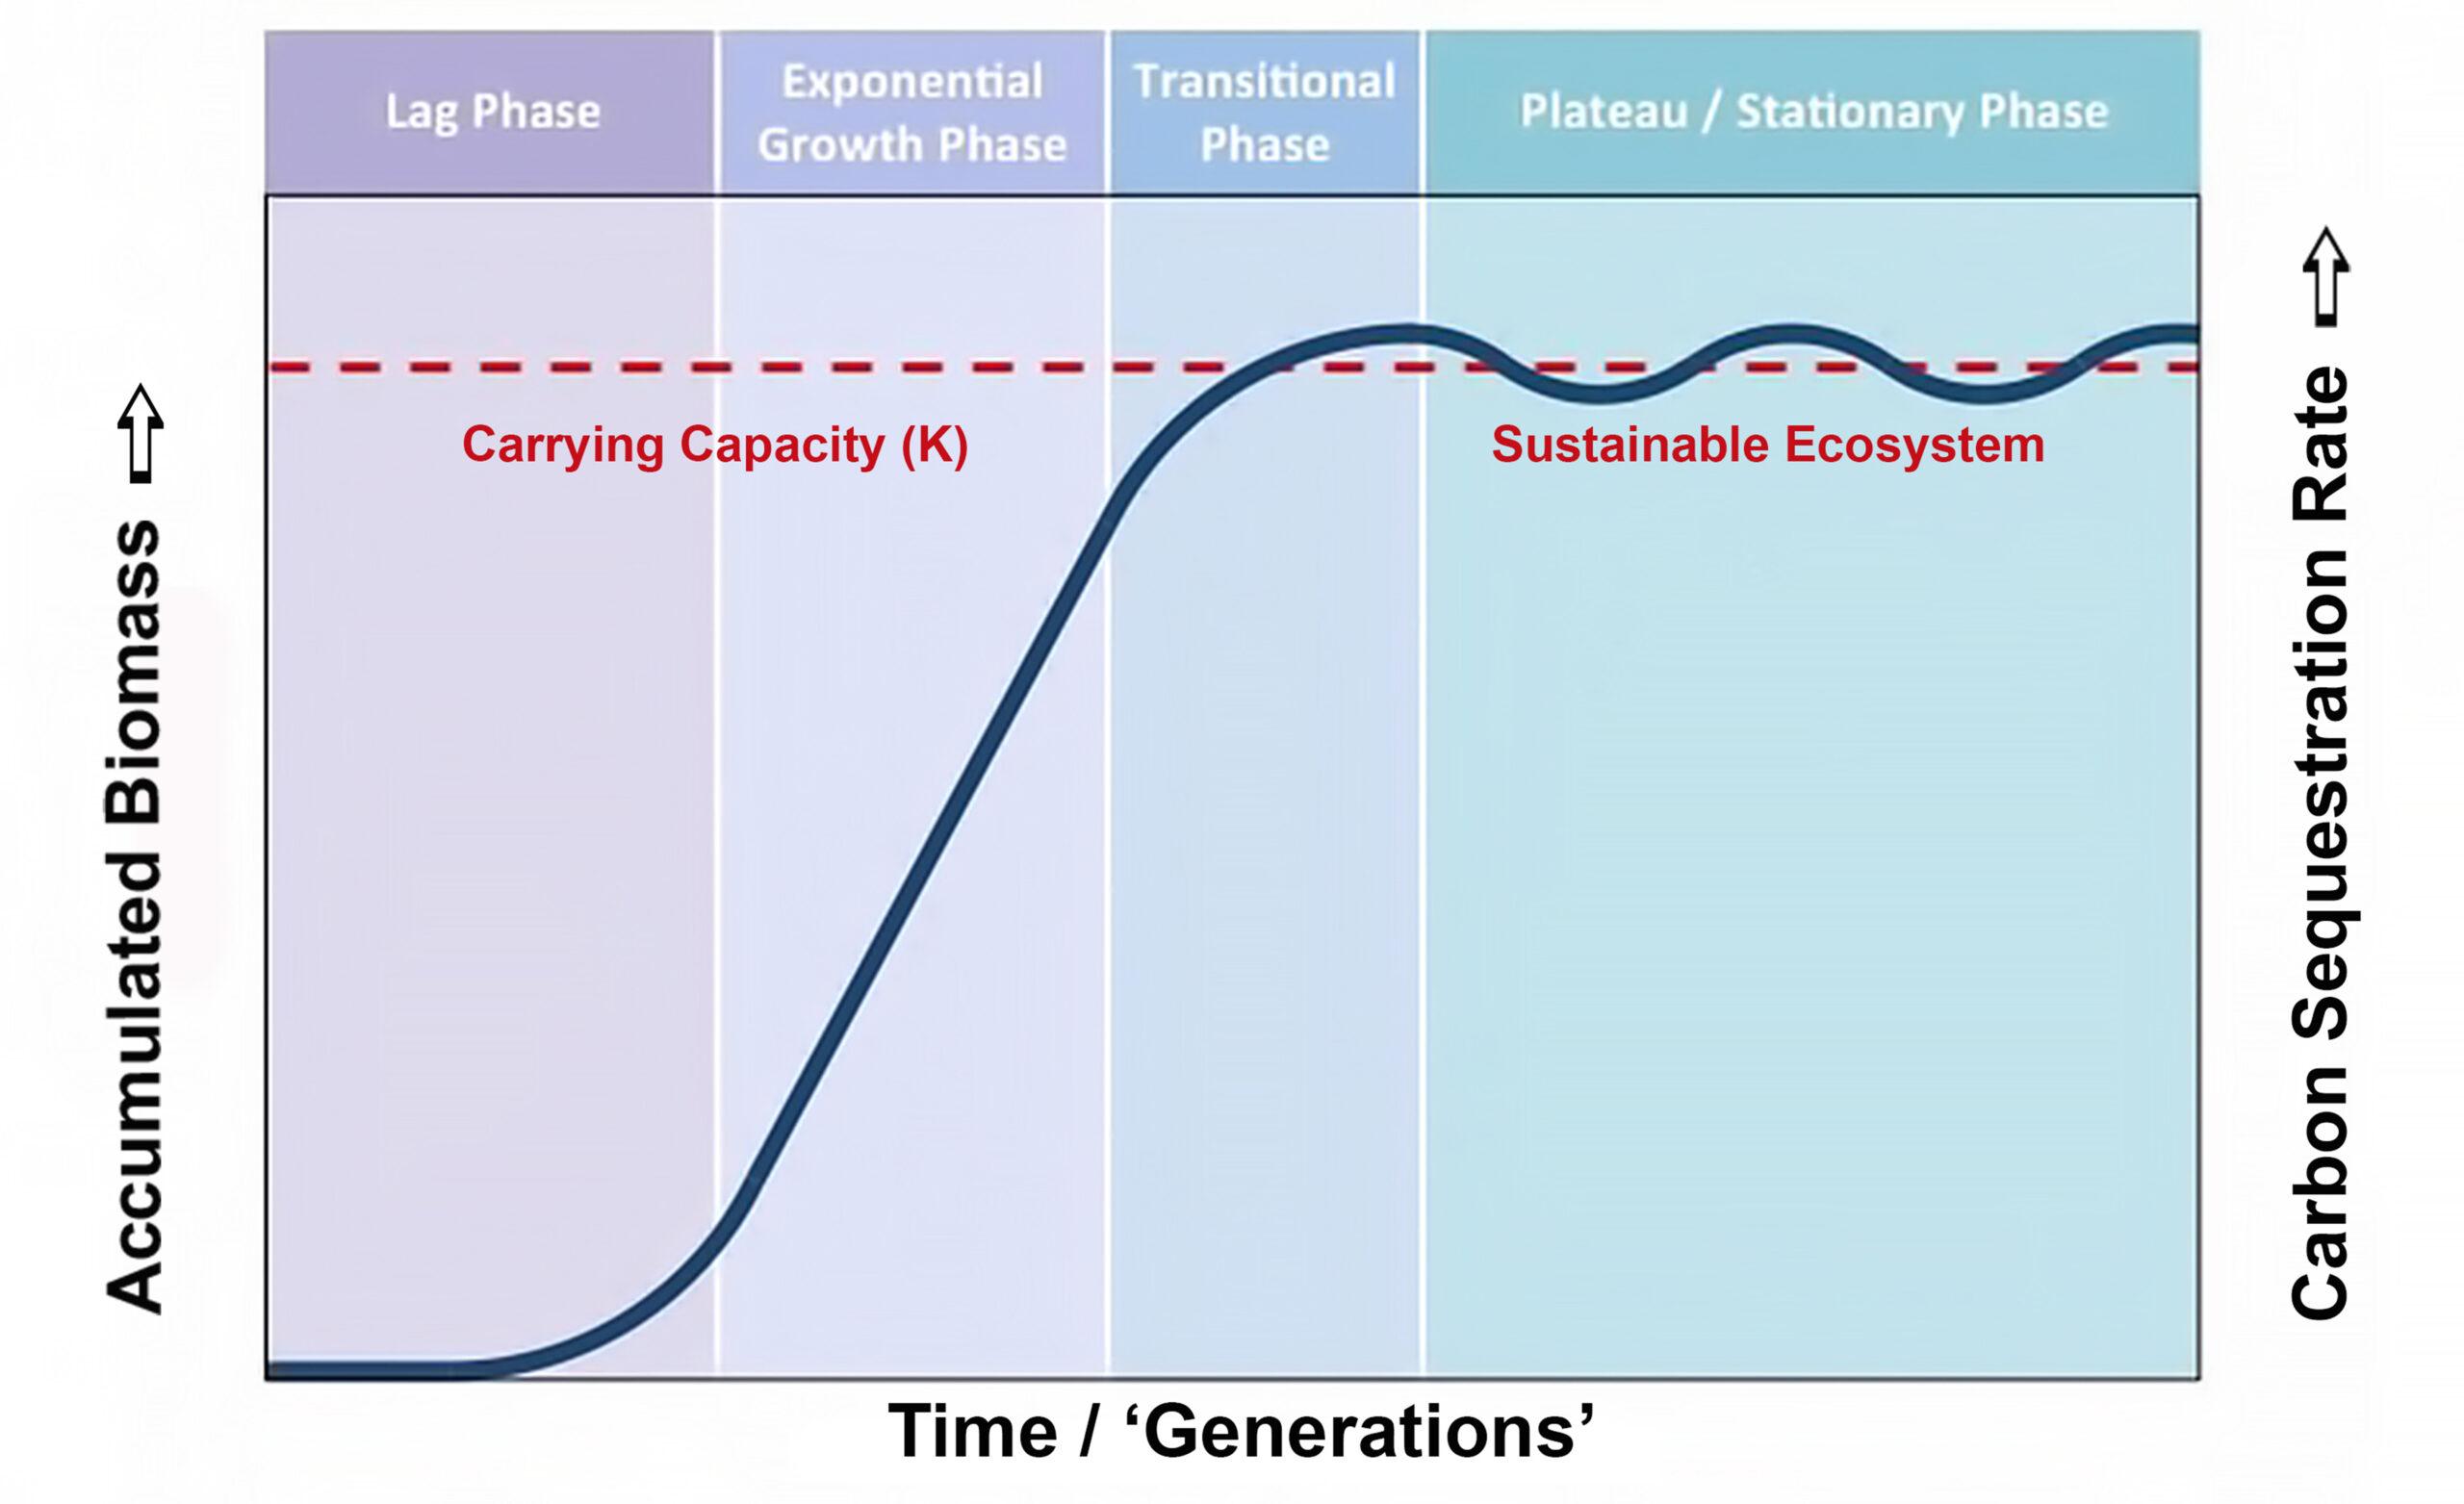 Source: modified from Bioninja  https://ib.bioninja.com.au/options/option-c-ecology-and-conser